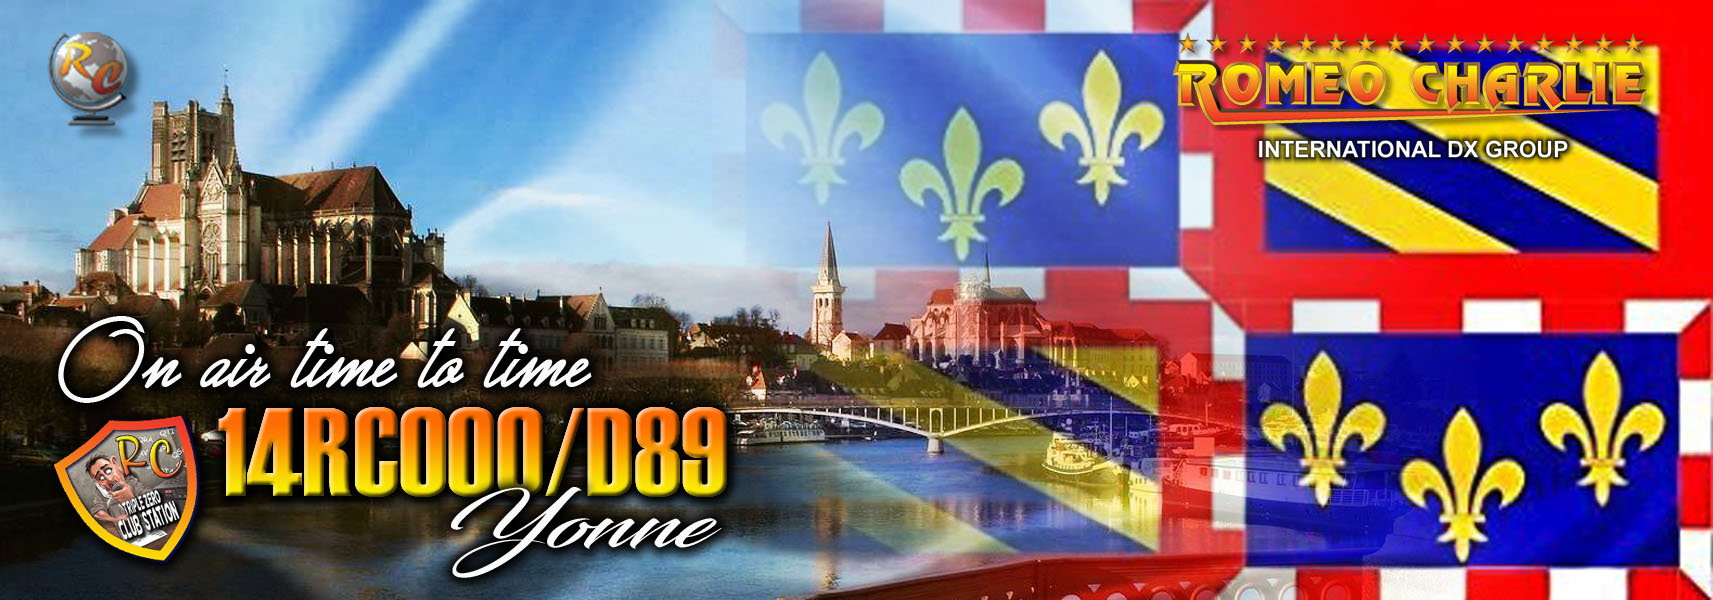 banner 14rc000d89